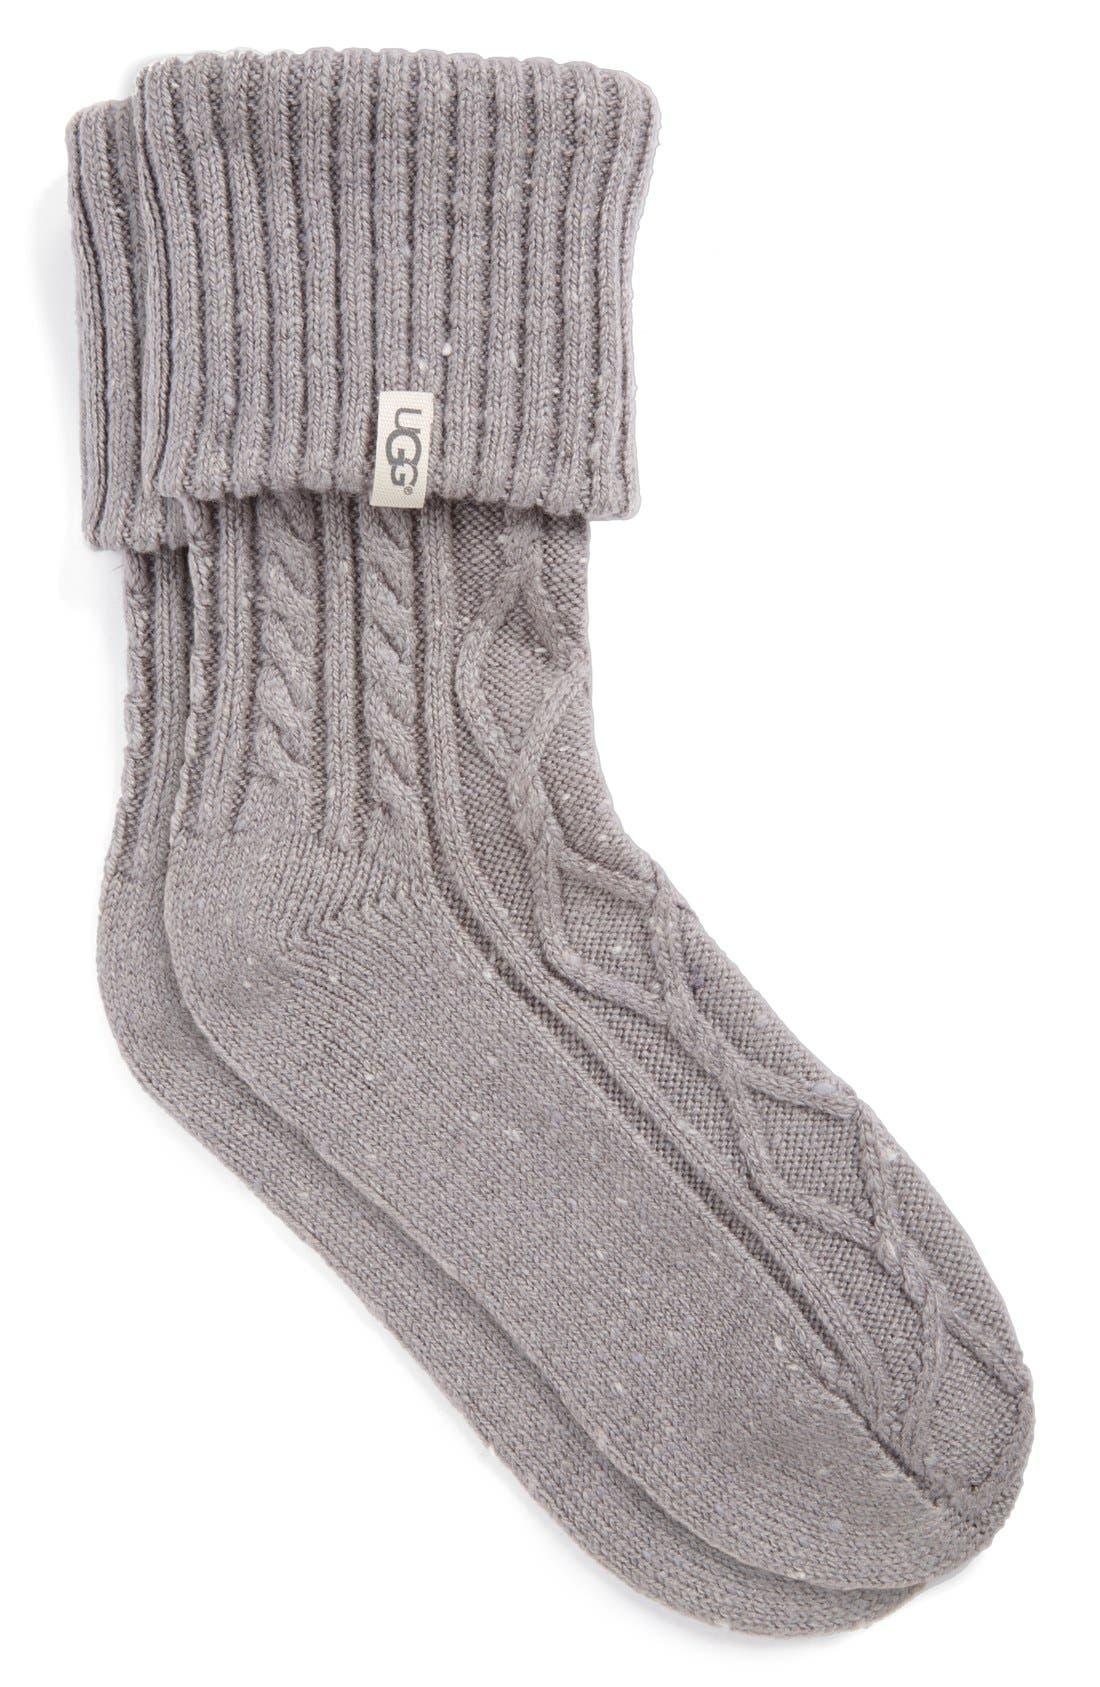 Alternate Image 1 Selected - UGG® 'Sienna' Short Boot Sock